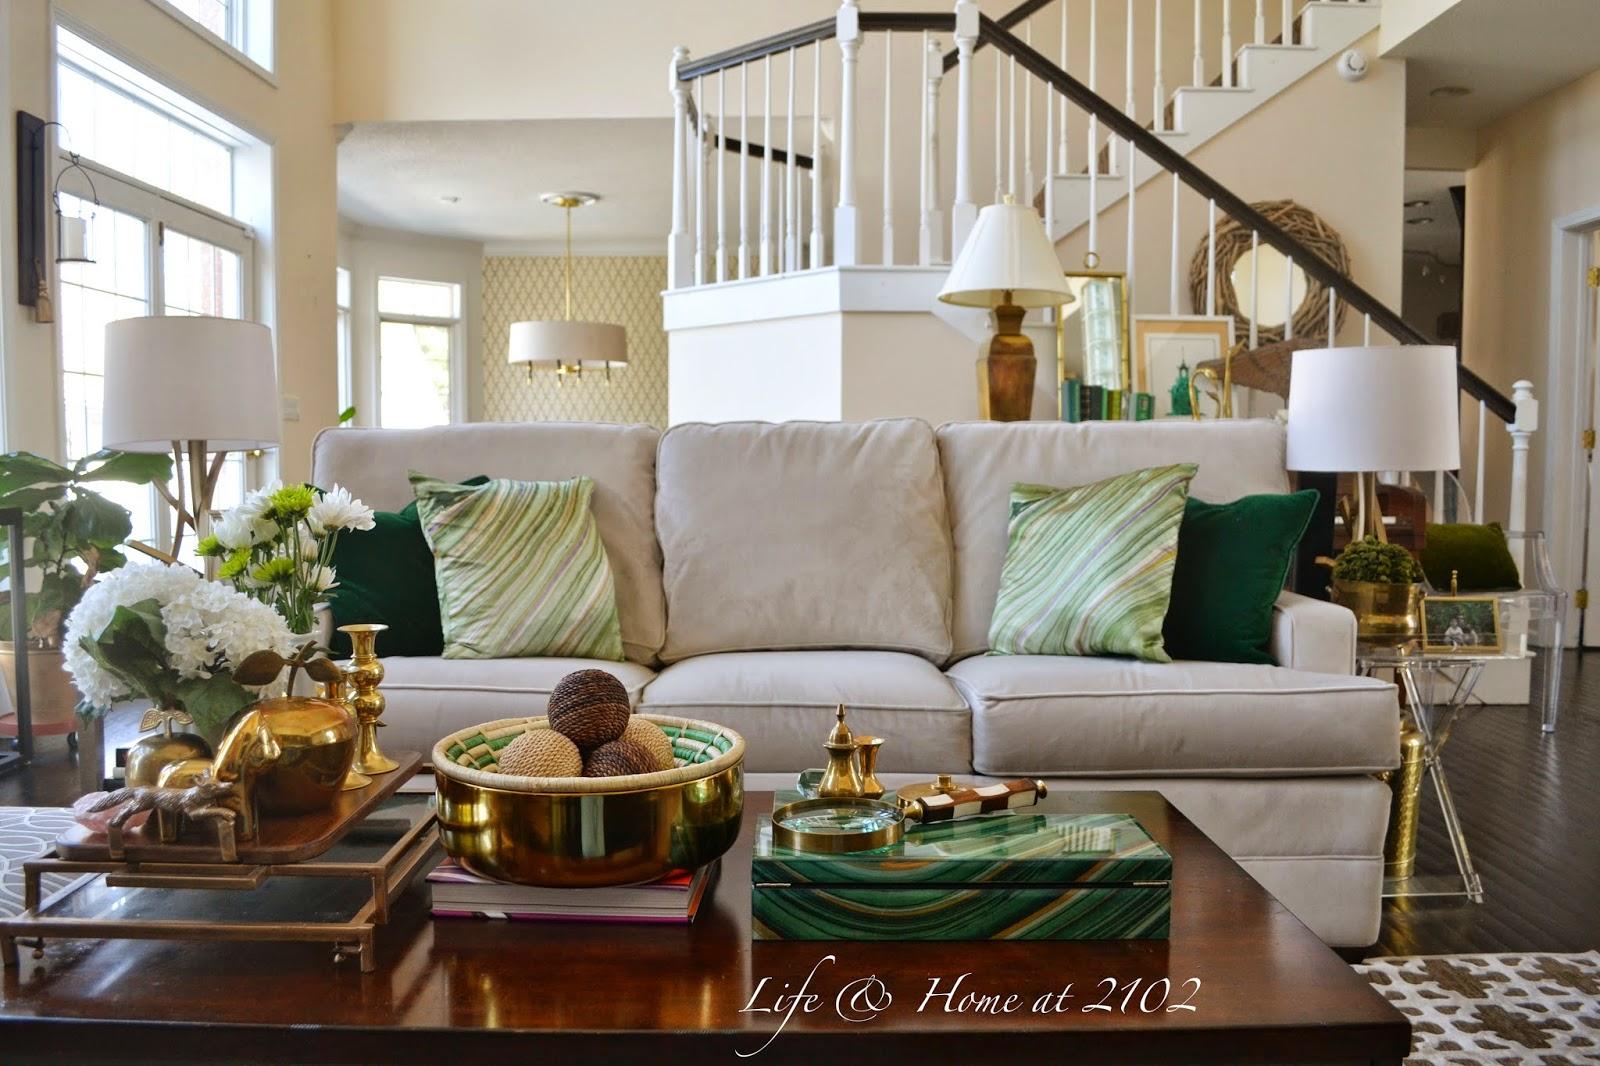 Life \u0026 Home at 2102: Spring Living Room